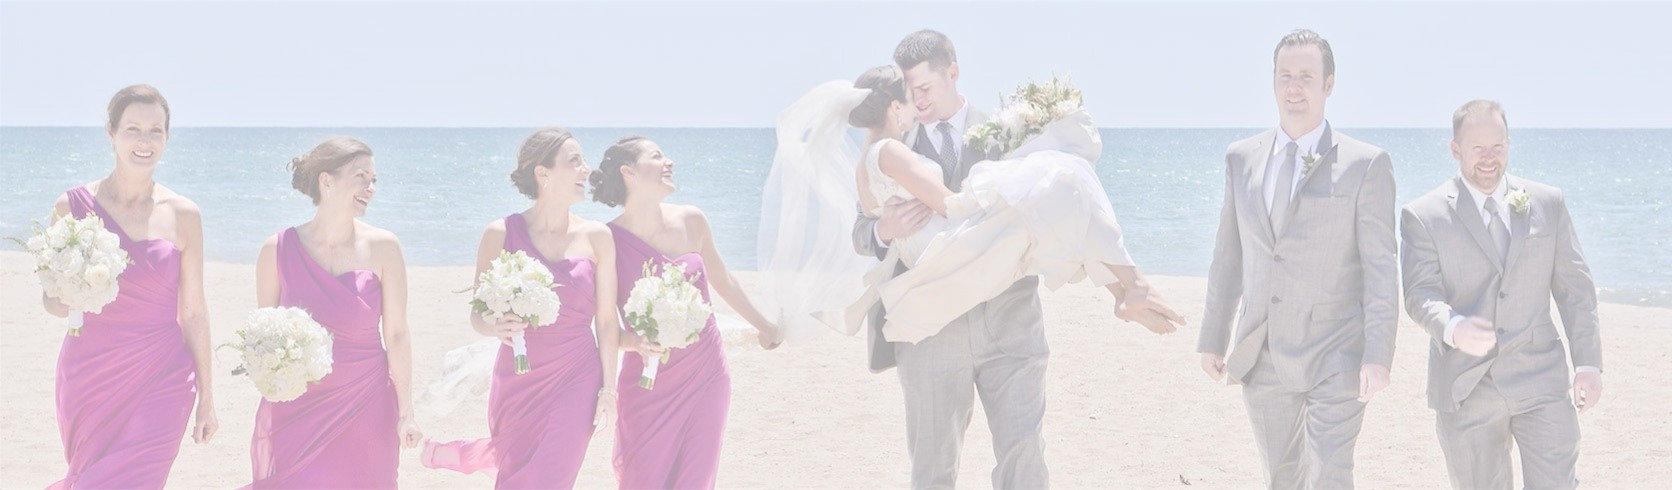 wedding_party_on_beach3_edited.jpg